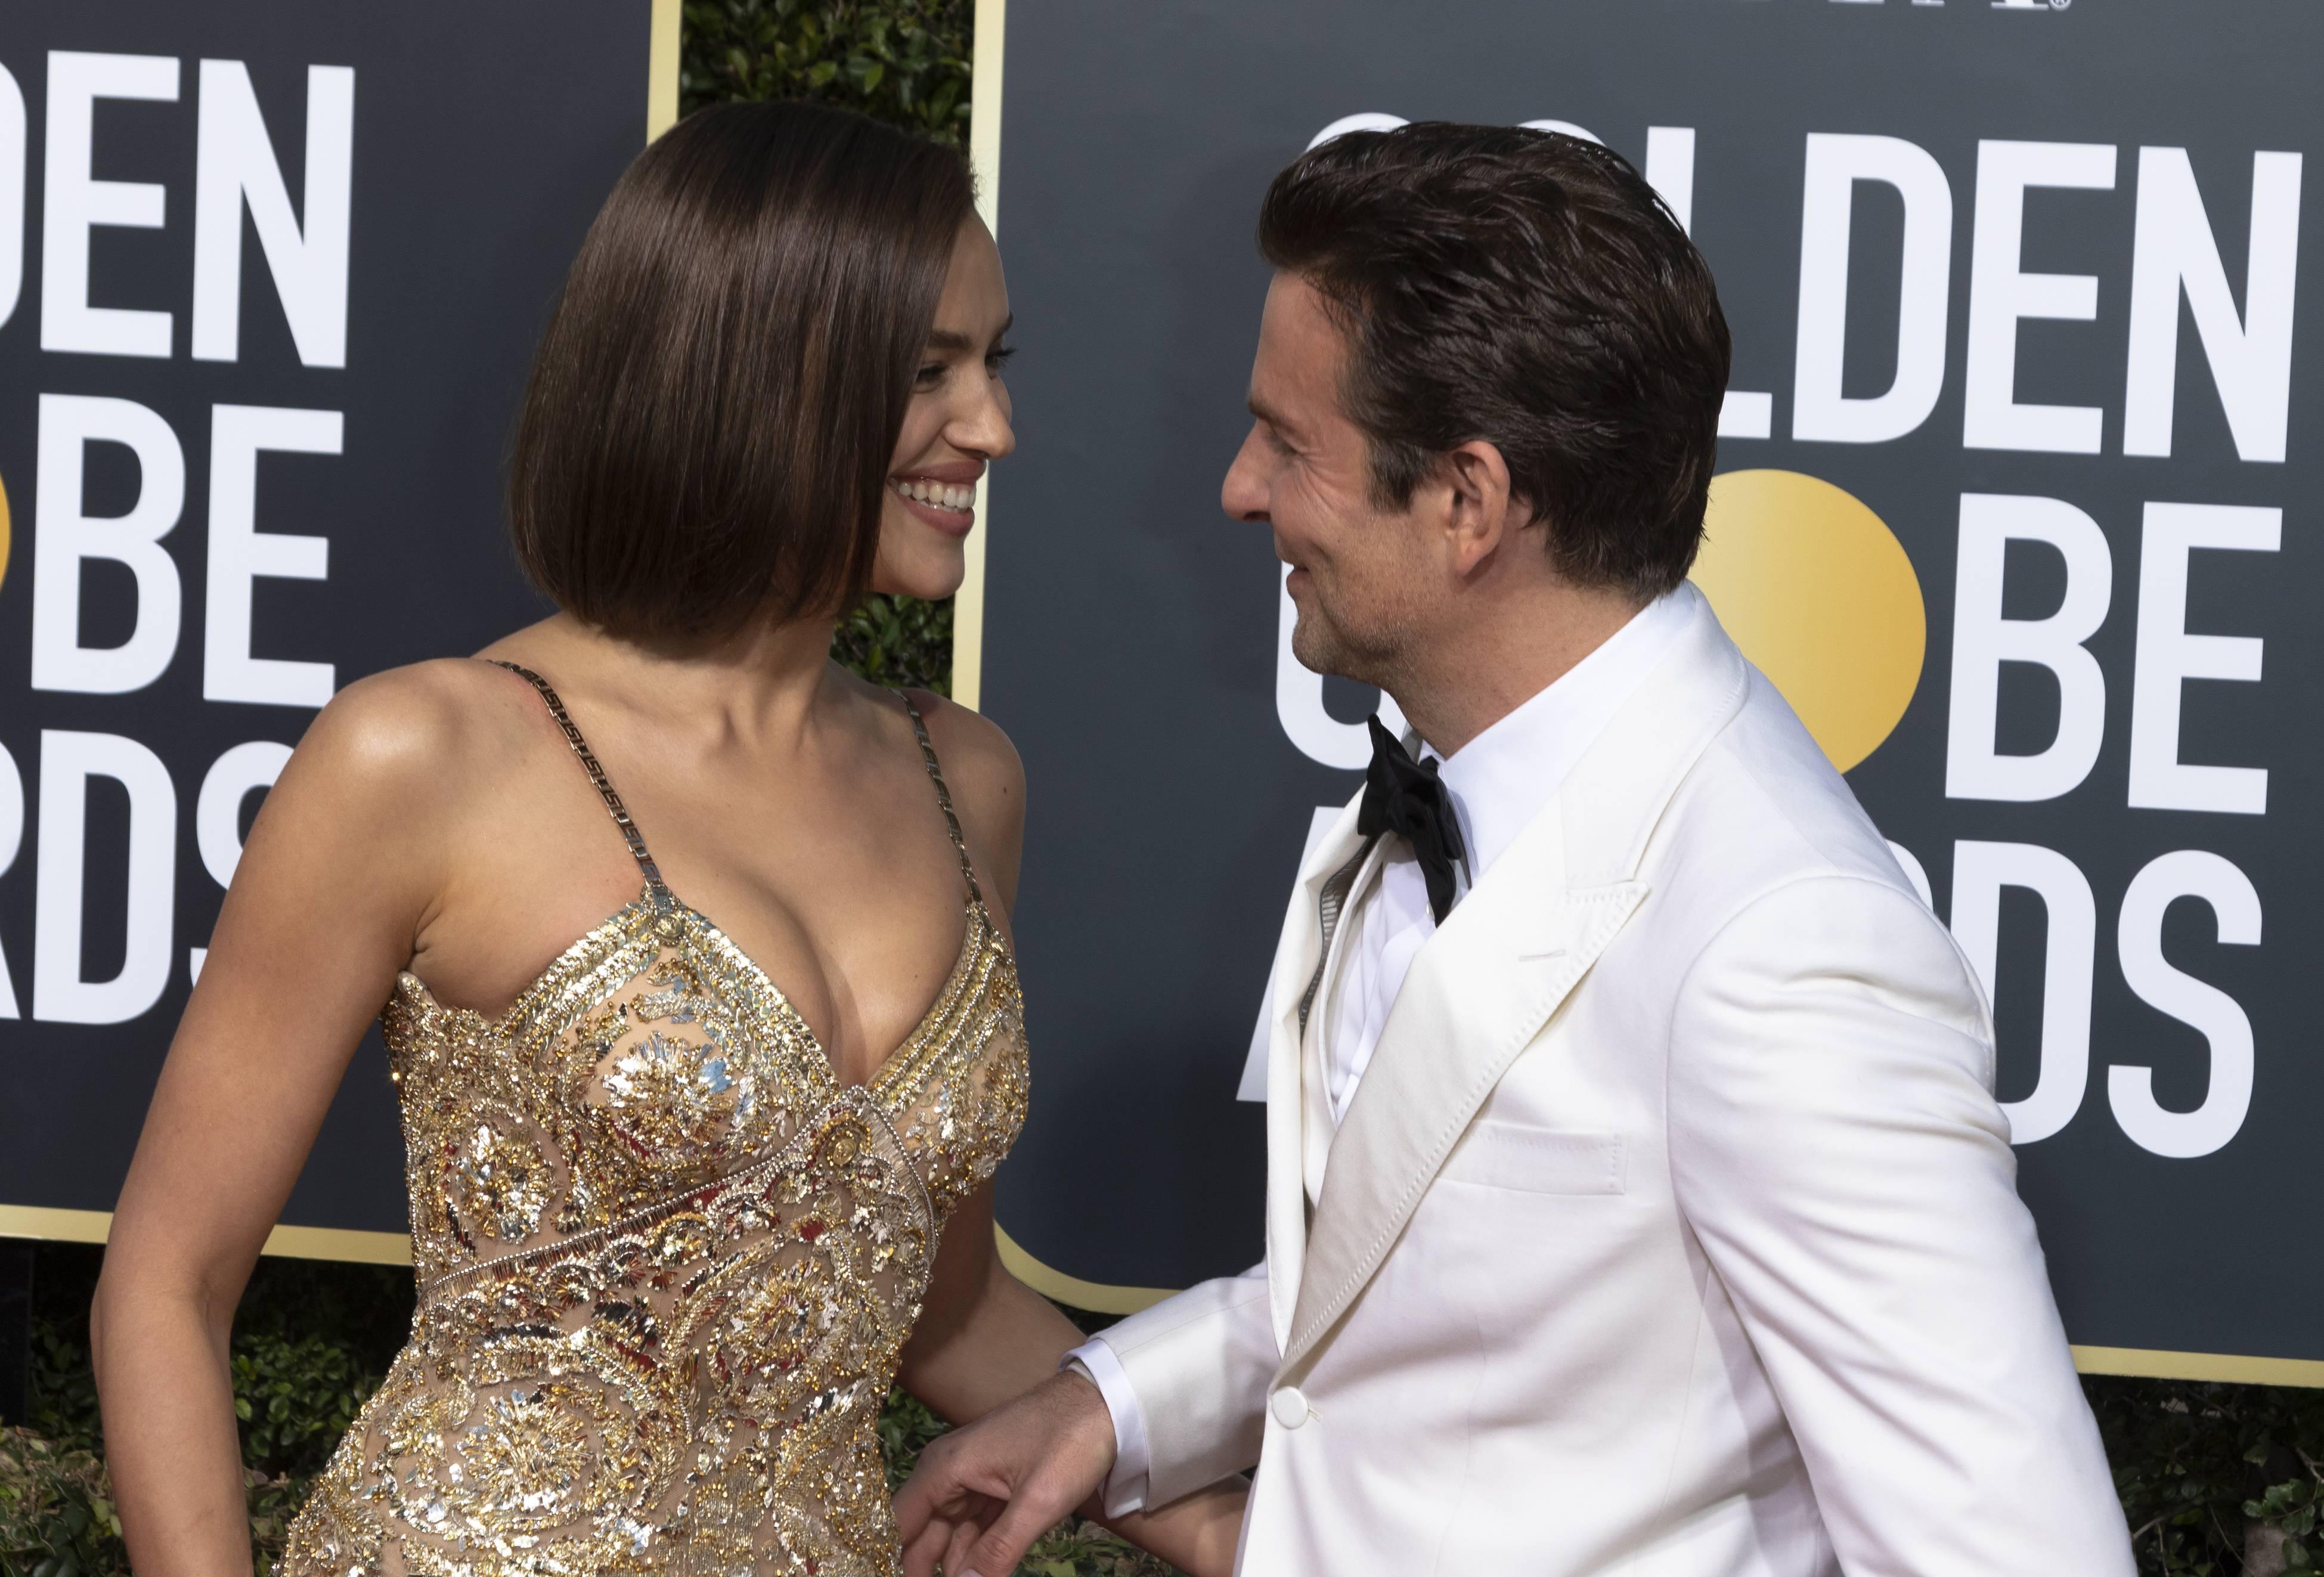 Bradley Cooper – Irina Shayk: Έτσι διαψεύδουν τις φήμες χωρισμού! Μαζί στο κόκκινο χαλί των «Χρυσών Σφαιρών» [pics] | tlife.gr